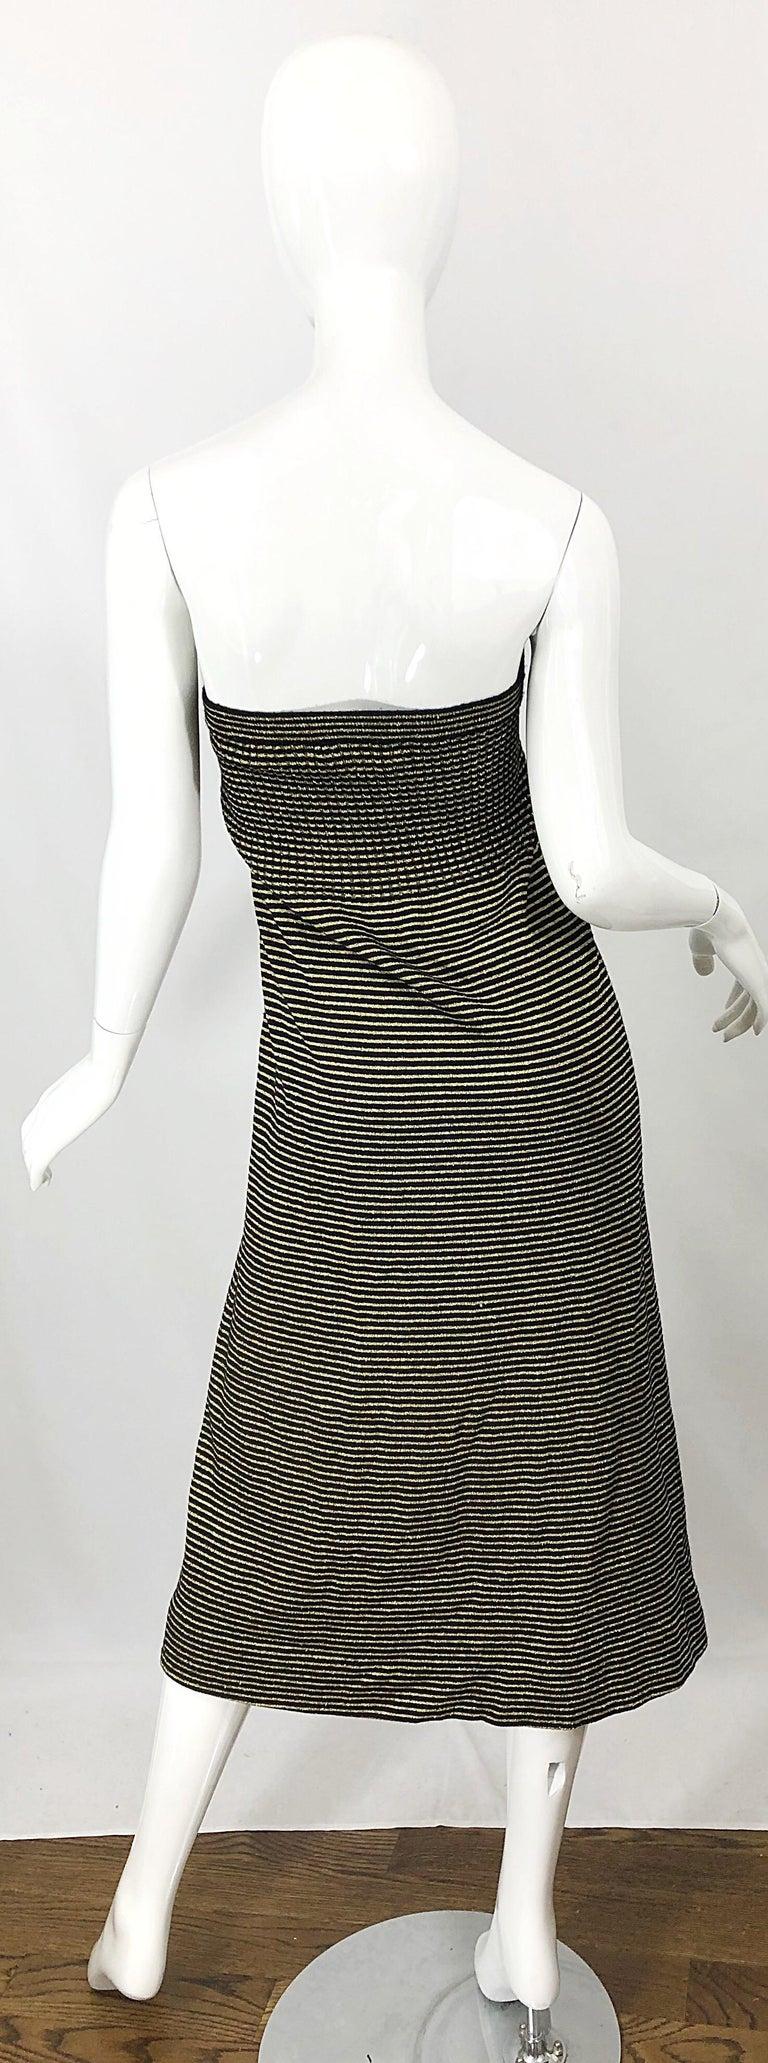 Vintage Yves Saint Laurent YSL 70s Gold Black Strapless Knit Dress or Maxi Skirt For Sale 2